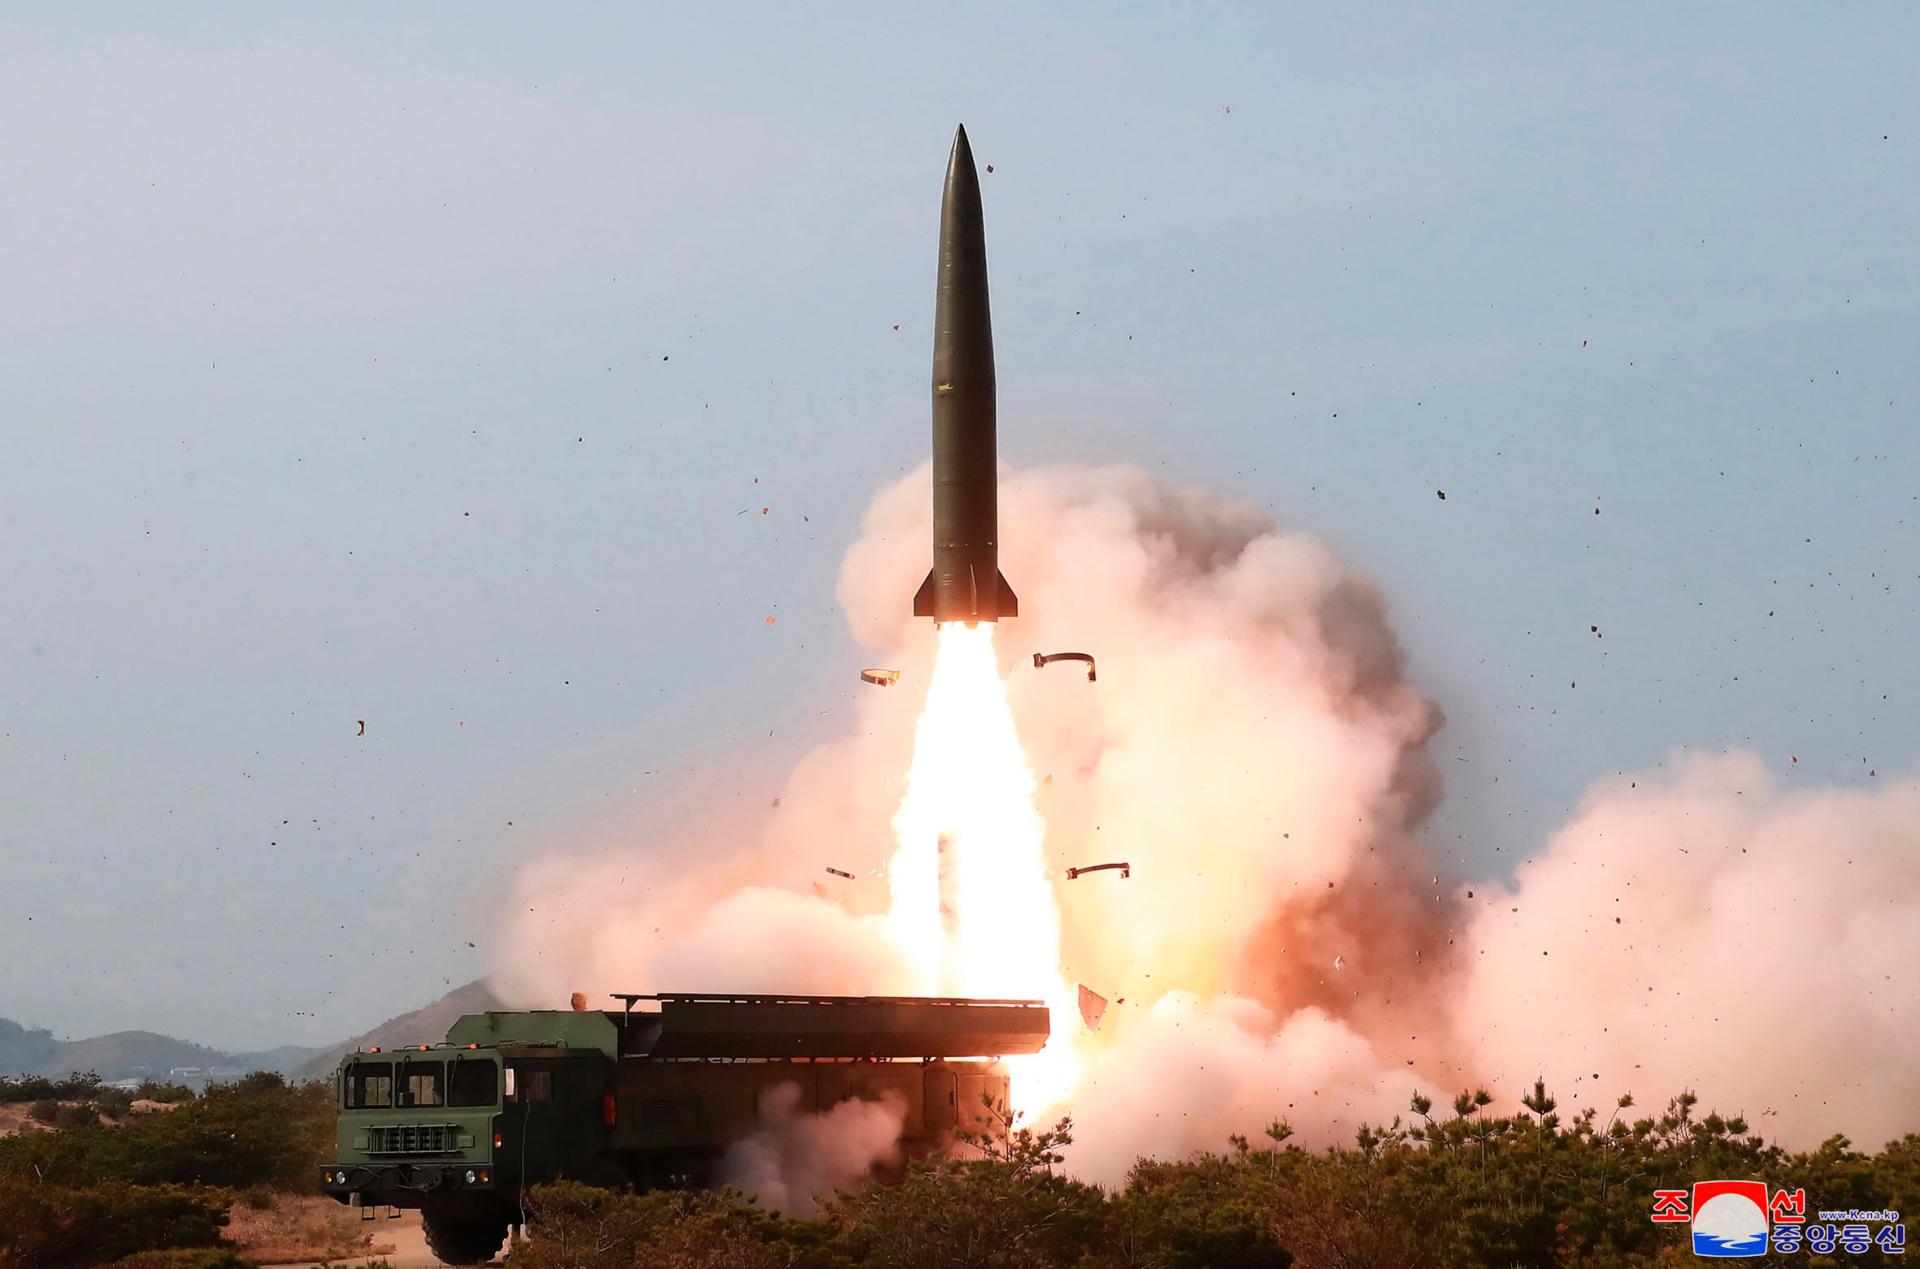 Westlake Legal Group ContentBroker_contentid-5924a9d212964f23b2fe4b42e4abf6e2-1 North Korea tests new missile _ and Trump's resolve fox-news/world/world-regions/asia fox-news/world fnc/world fnc ERIC TALMADGE Associated Press article a646c532-ba2a-504c-83ca-560704c9e3b4